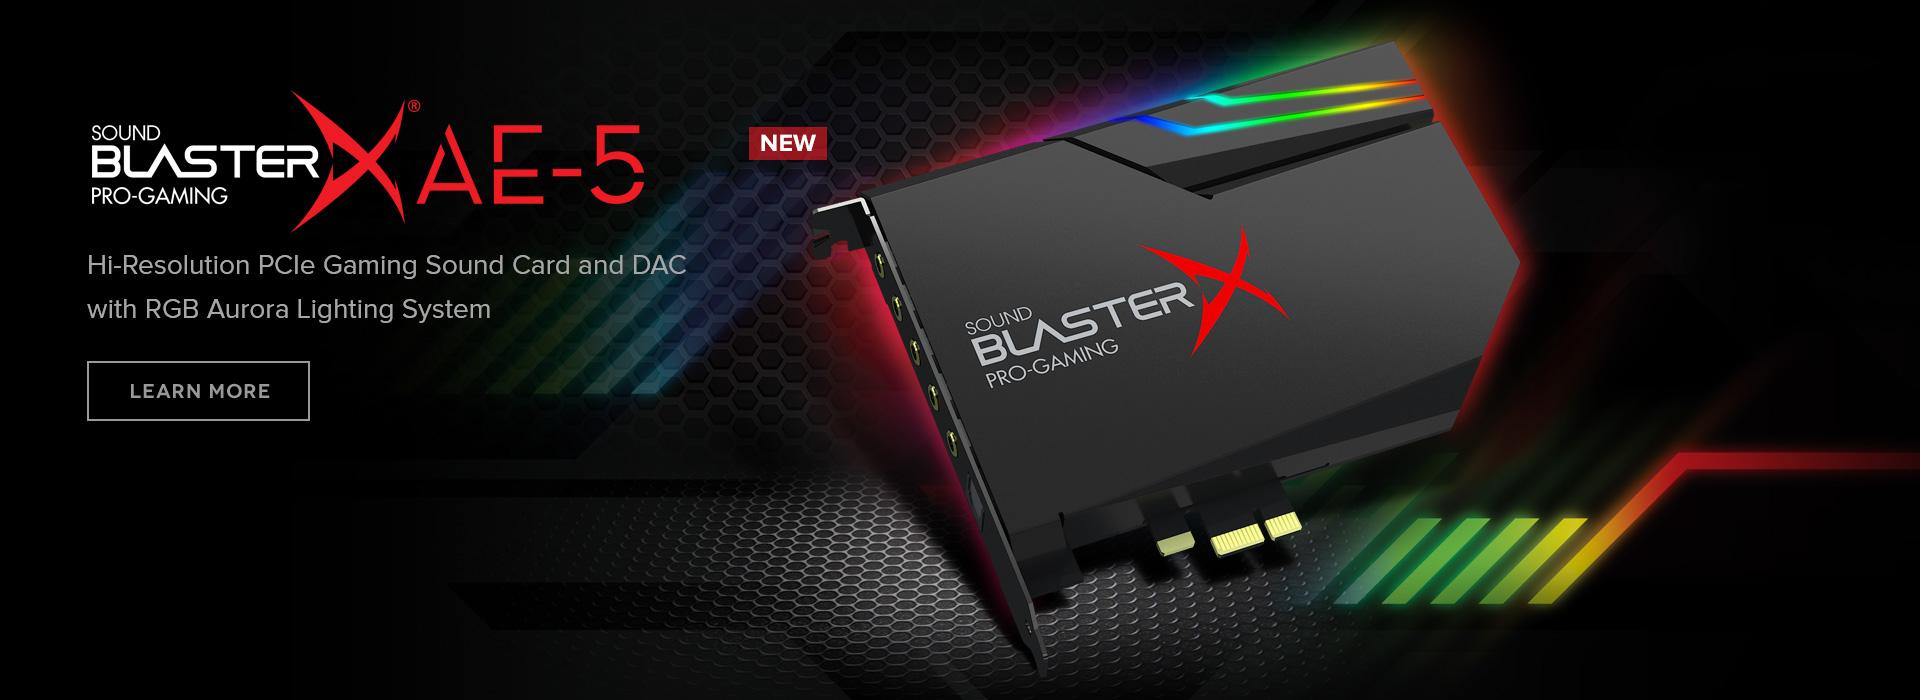 Sound Blaster Sound Cards, Gaming Headsets, Sound